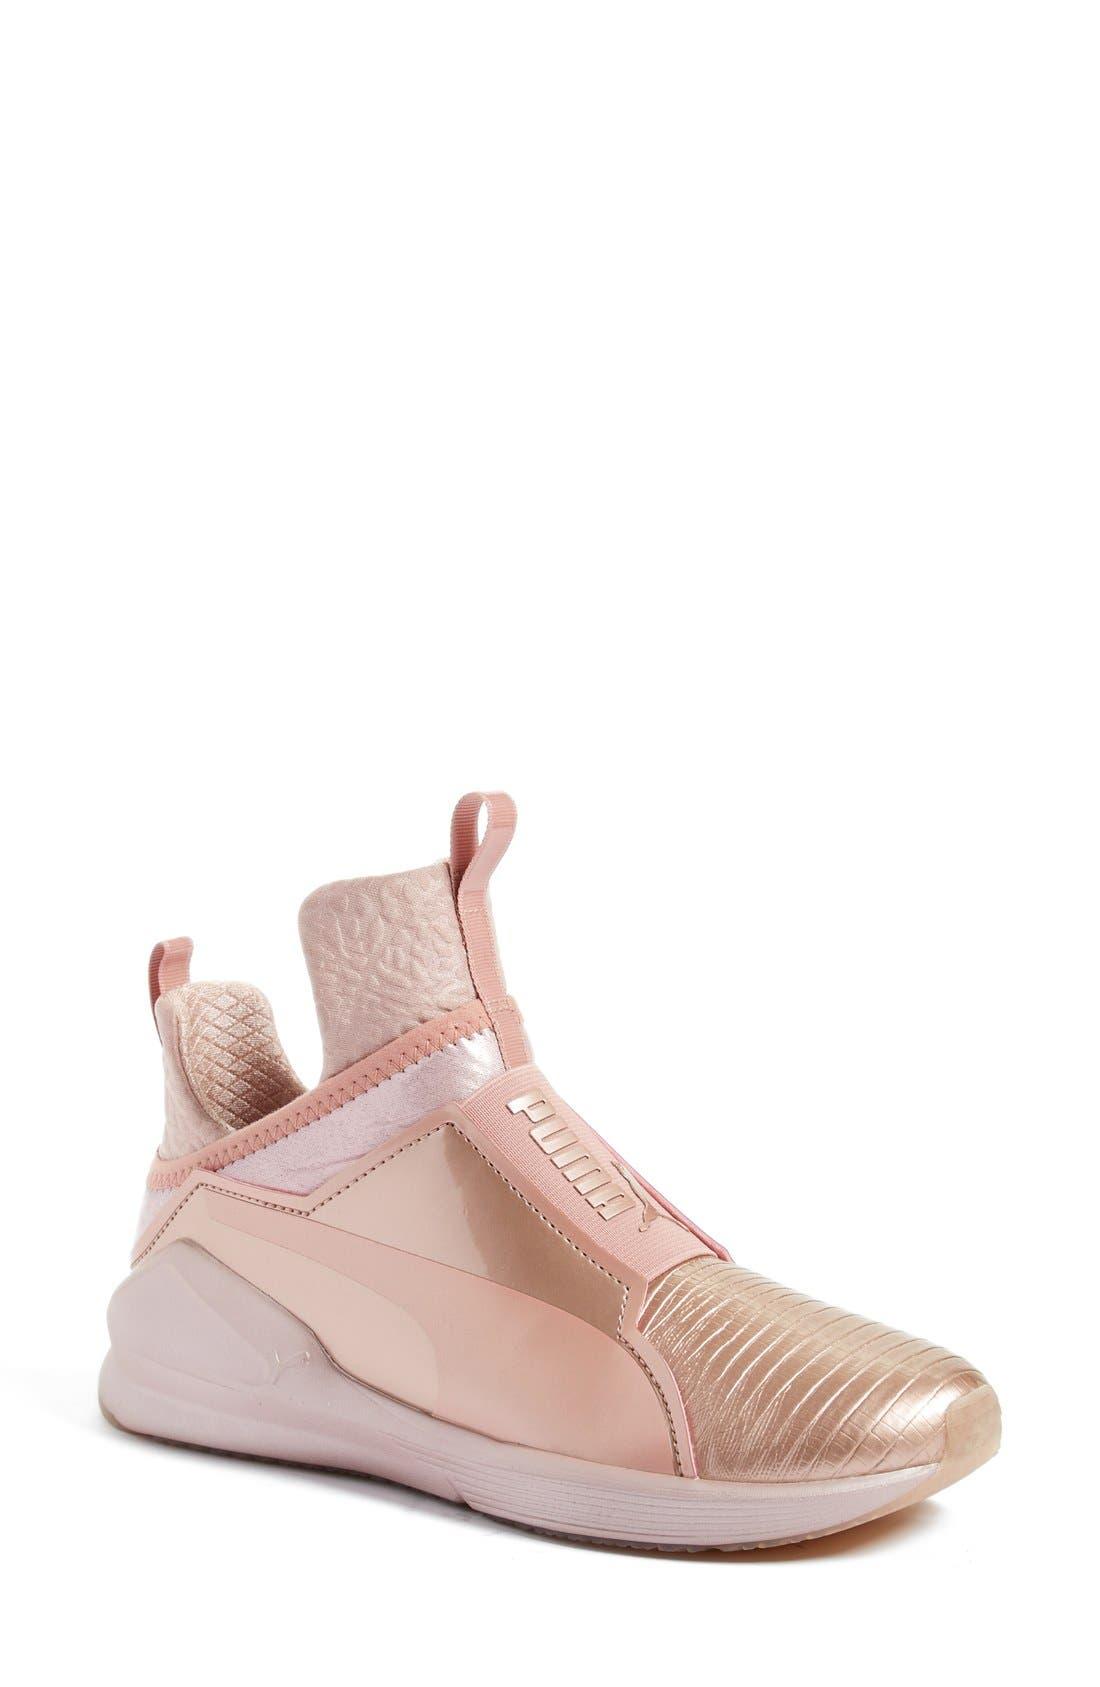 Main Image - PUMA Fierce Metallic High Top Sneaker (Women)